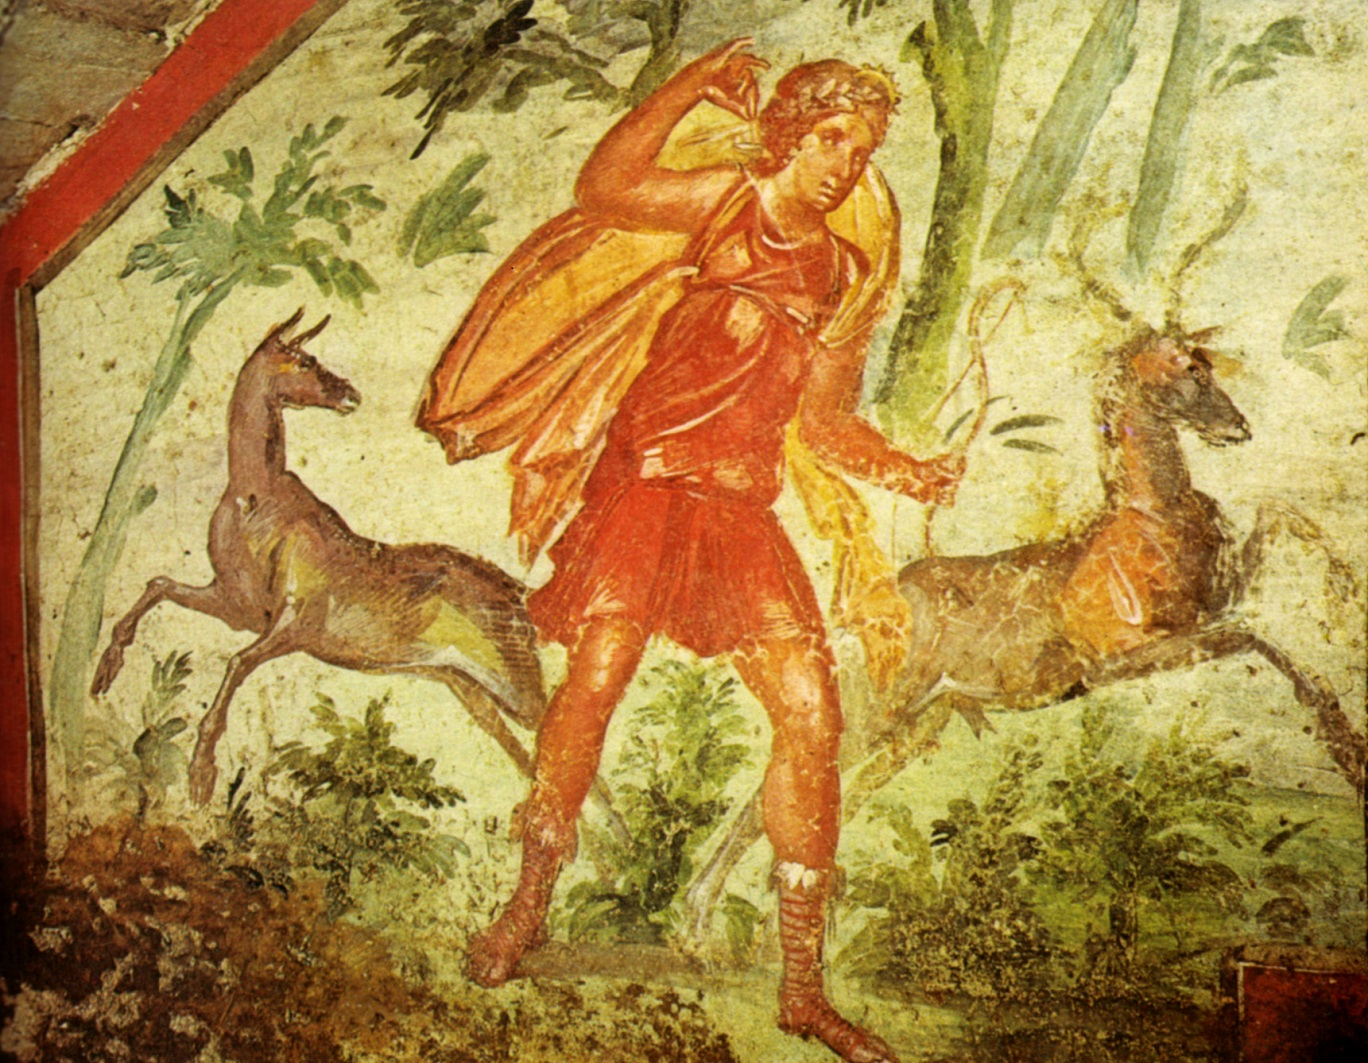 The Goddess Diana Hunting Source https://commons.wikimedia.org/wiki/File%3AIpogeo_di_via_livenza%2C_diana_cacciatrice.jpg